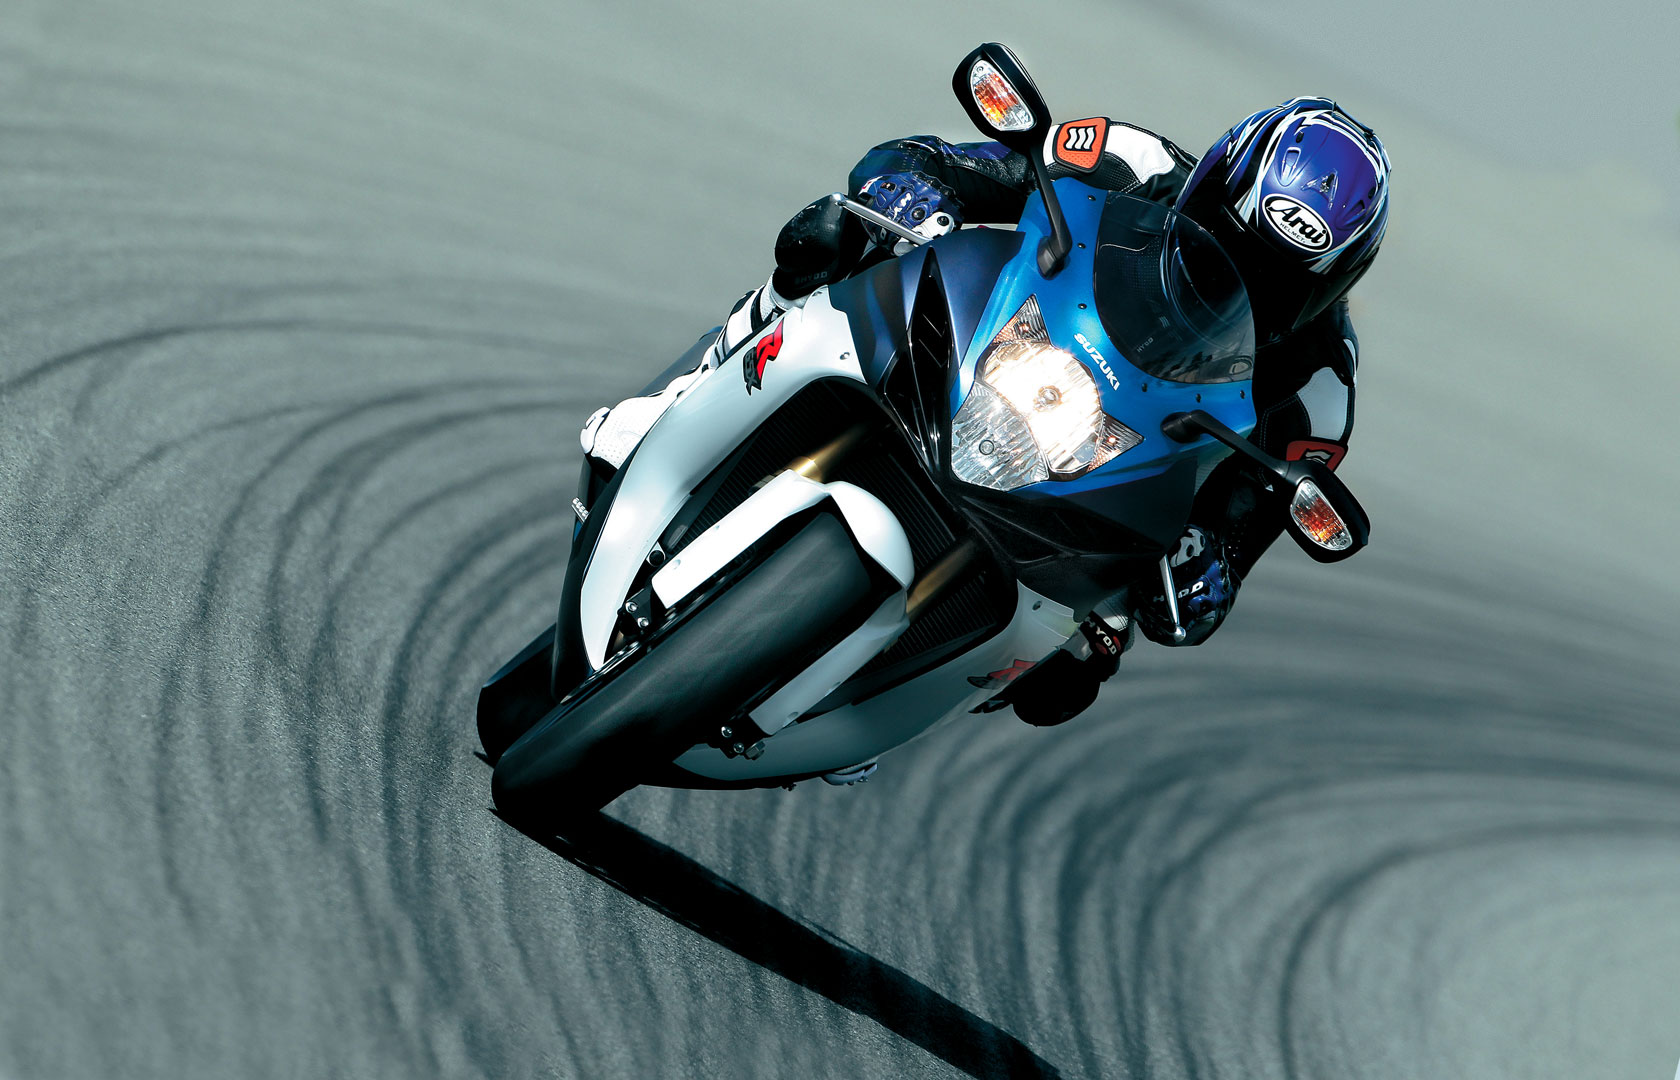 Honda Motorcycle Suzuki Gsx R Sportbike Free 266158 Wallpaper wallpaper